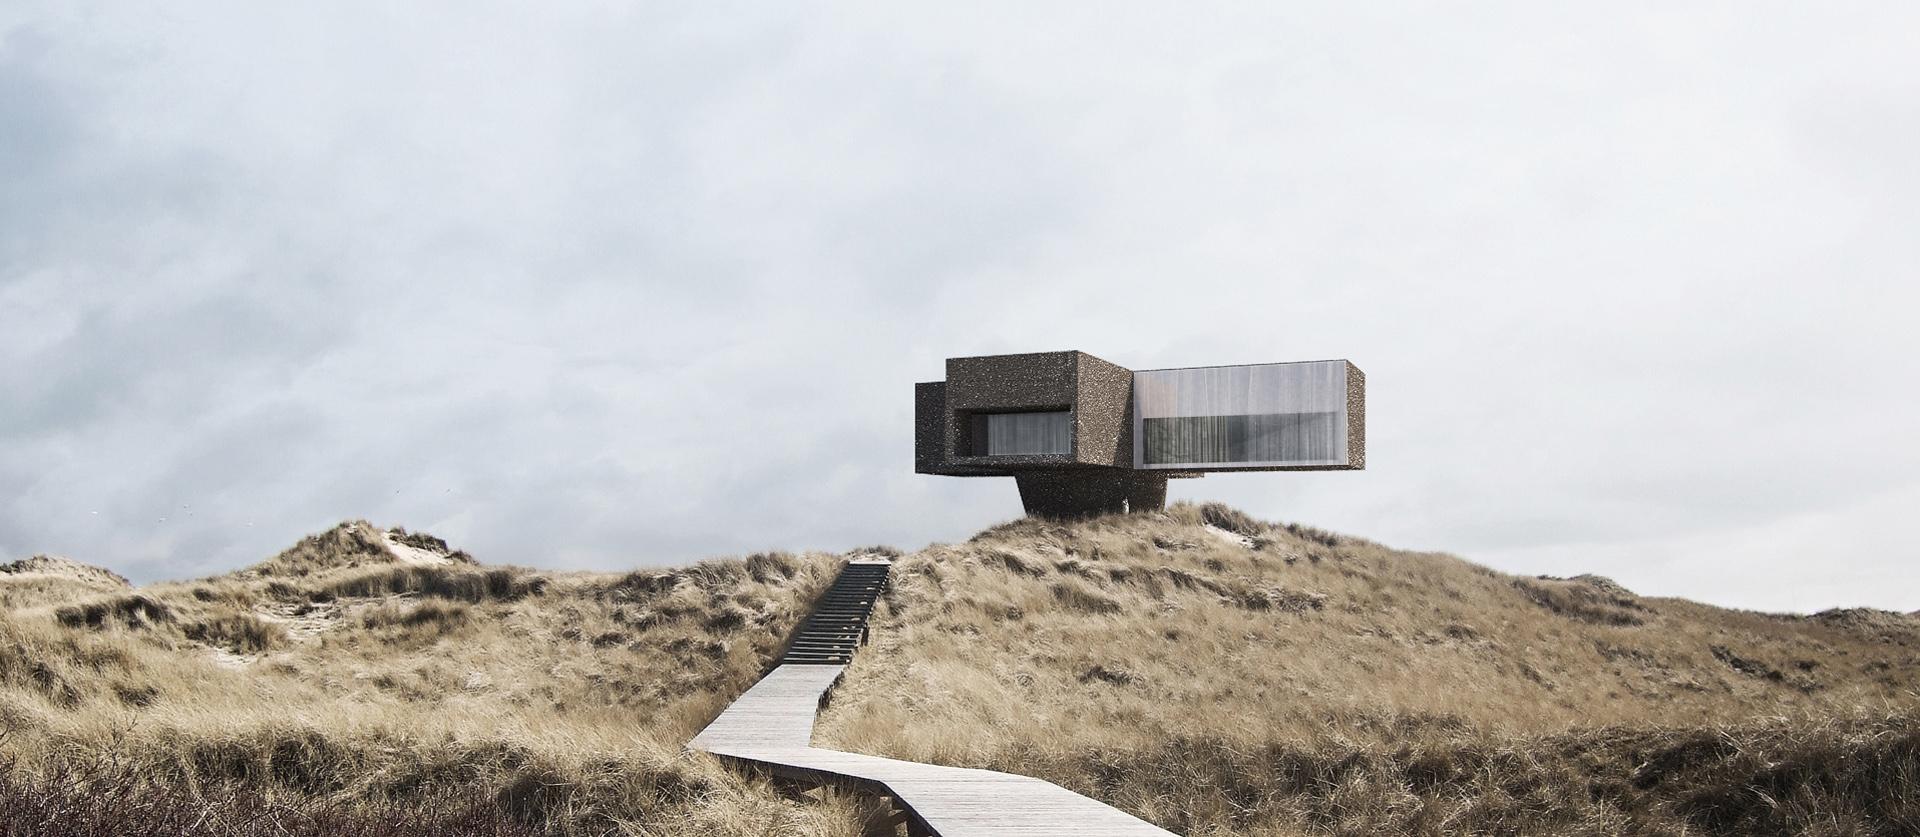 Conheça 5 estruturas de casas que desafiam totalmente a lei gravidade   Lista 360